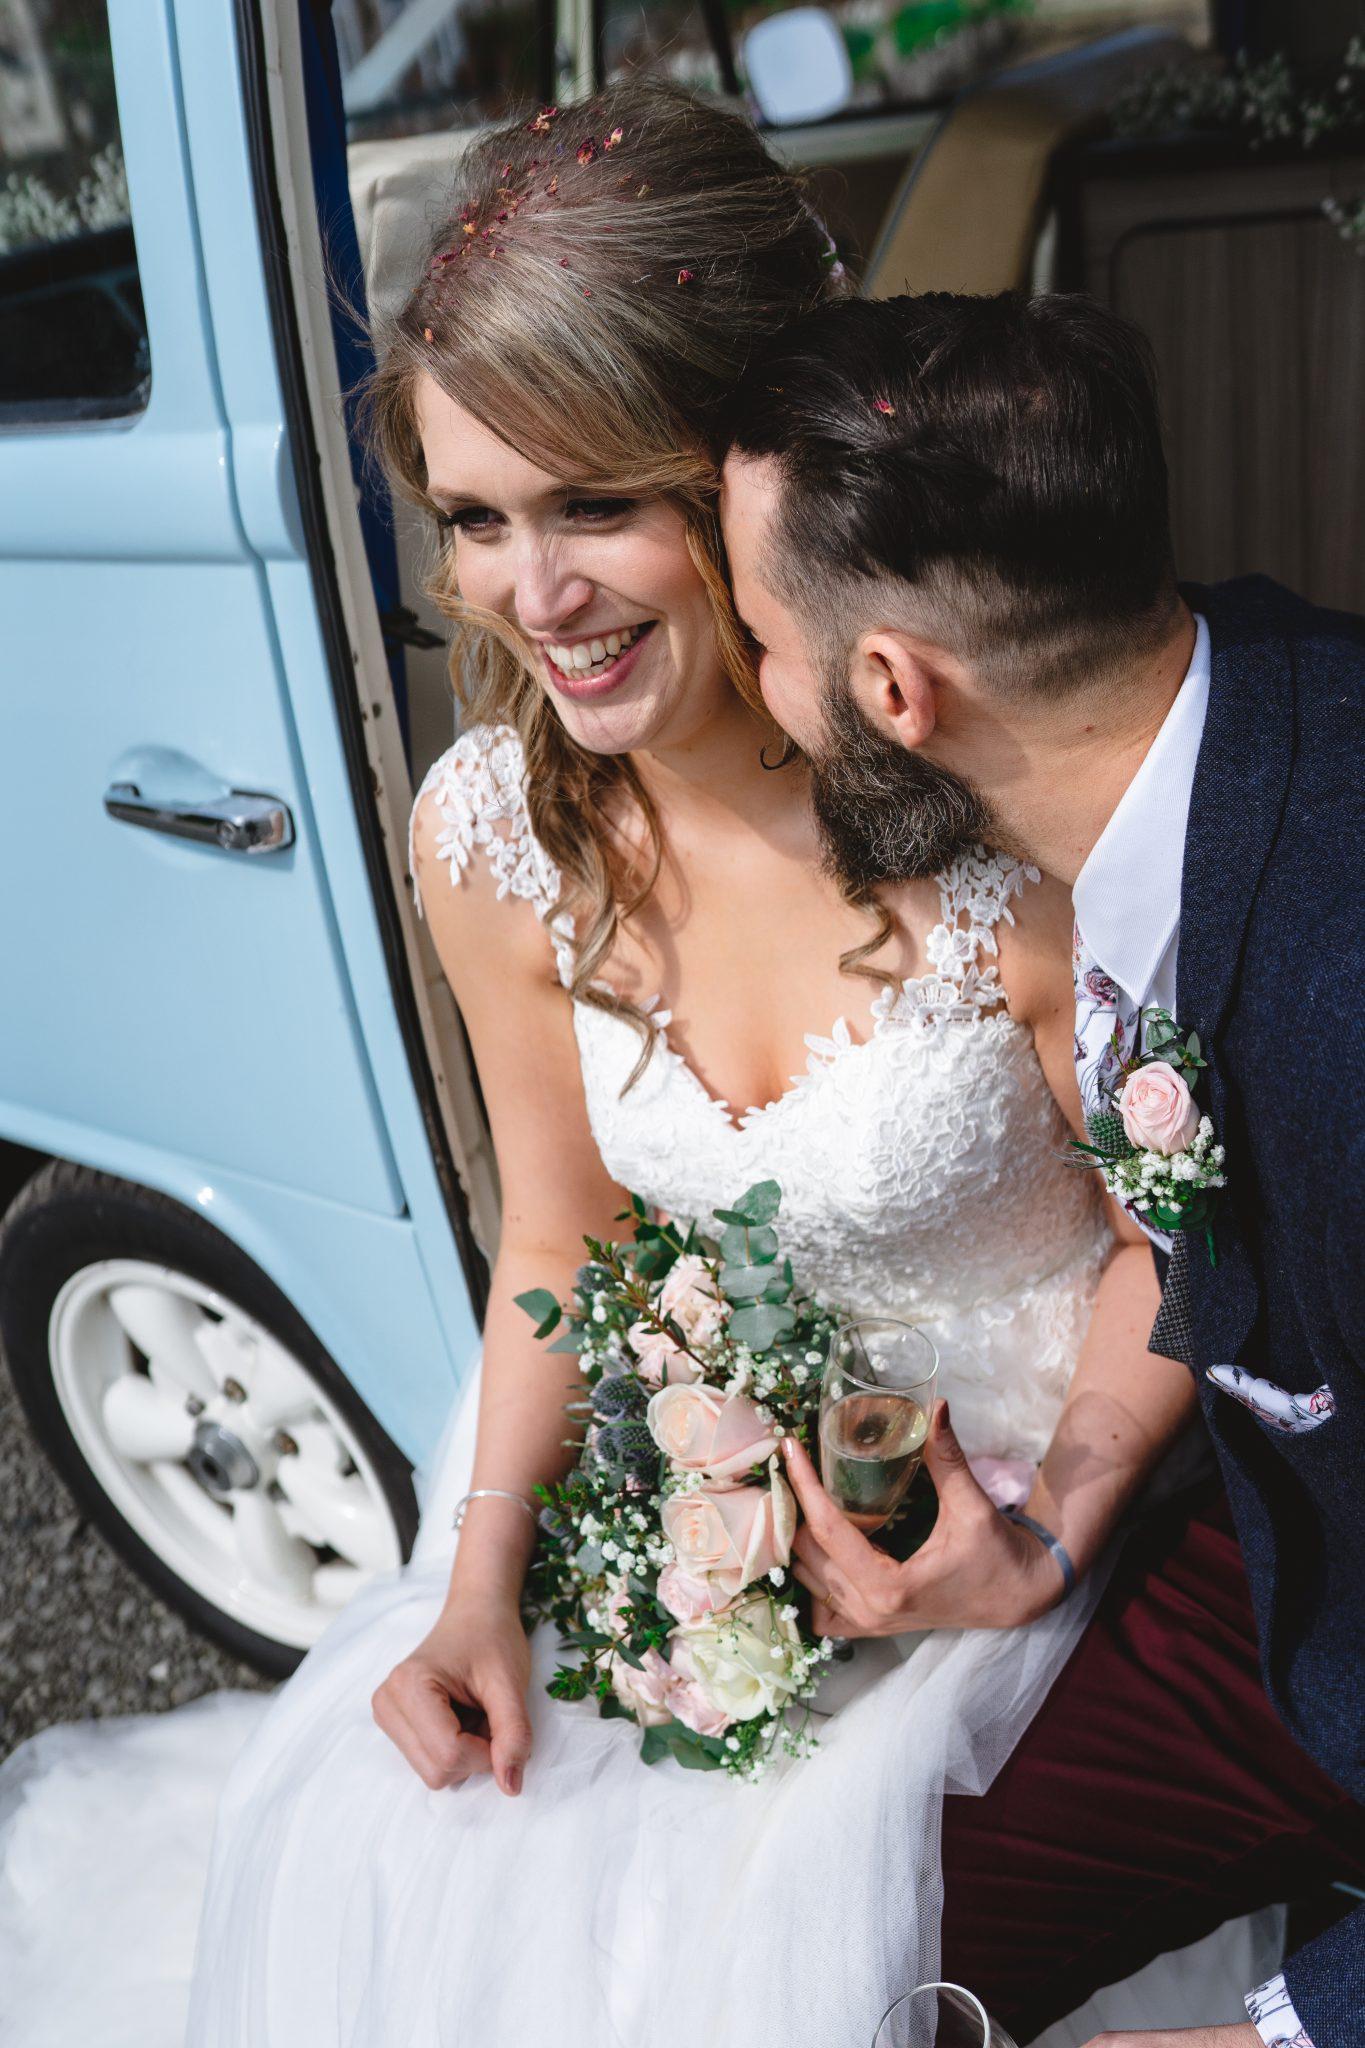 Pentillie Castle Wedding Venue Bride and Groom with VW Camper Van